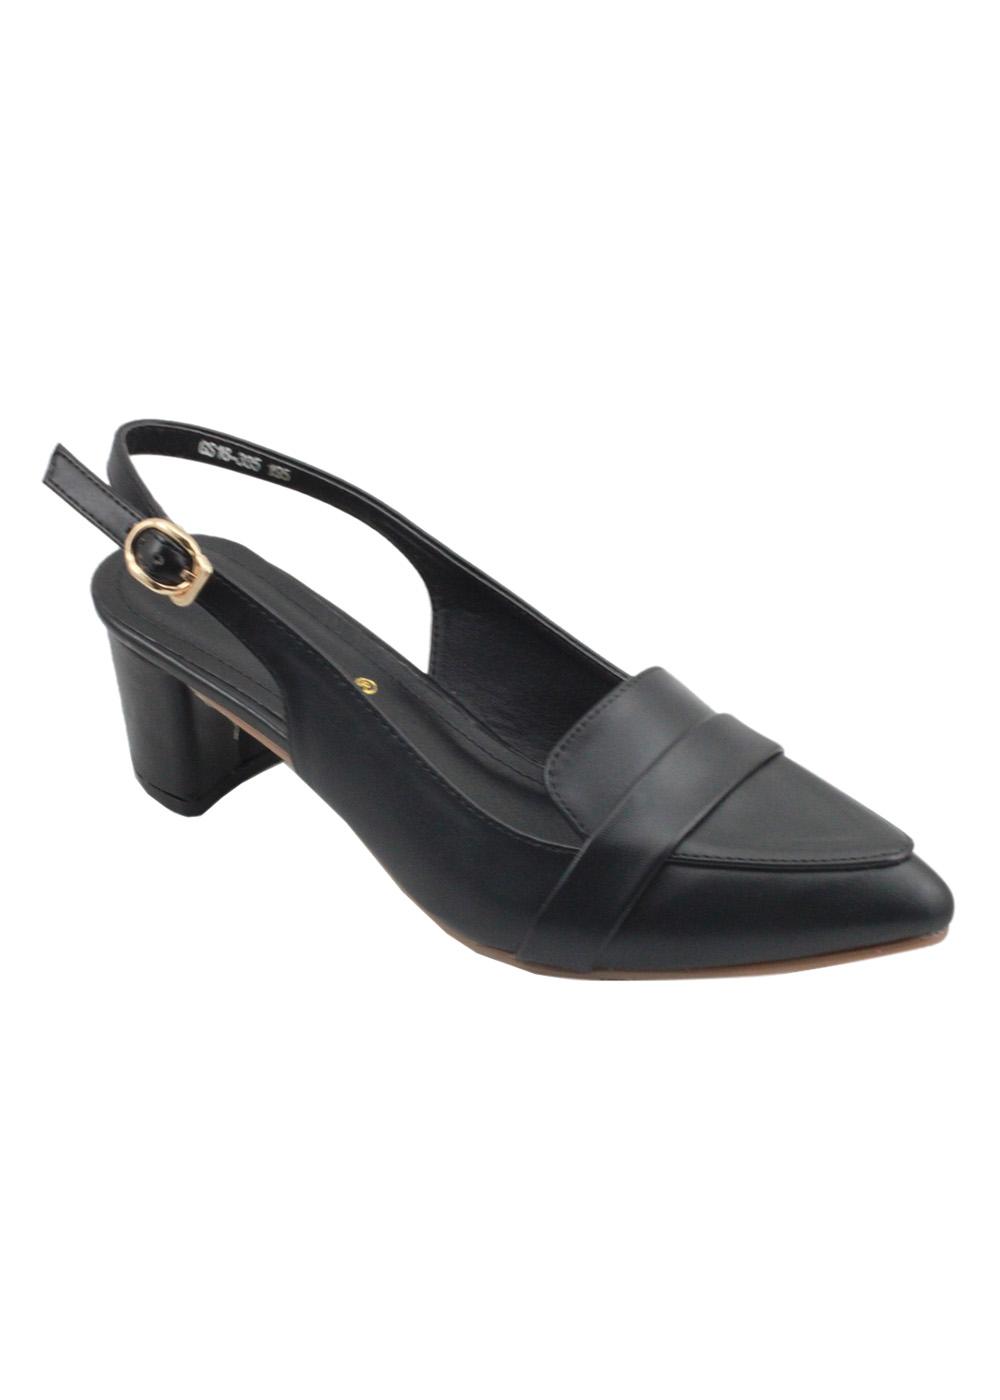 Giày Sandal Cao Gót 5cm G Alanti GS16-385-195-D - Đen